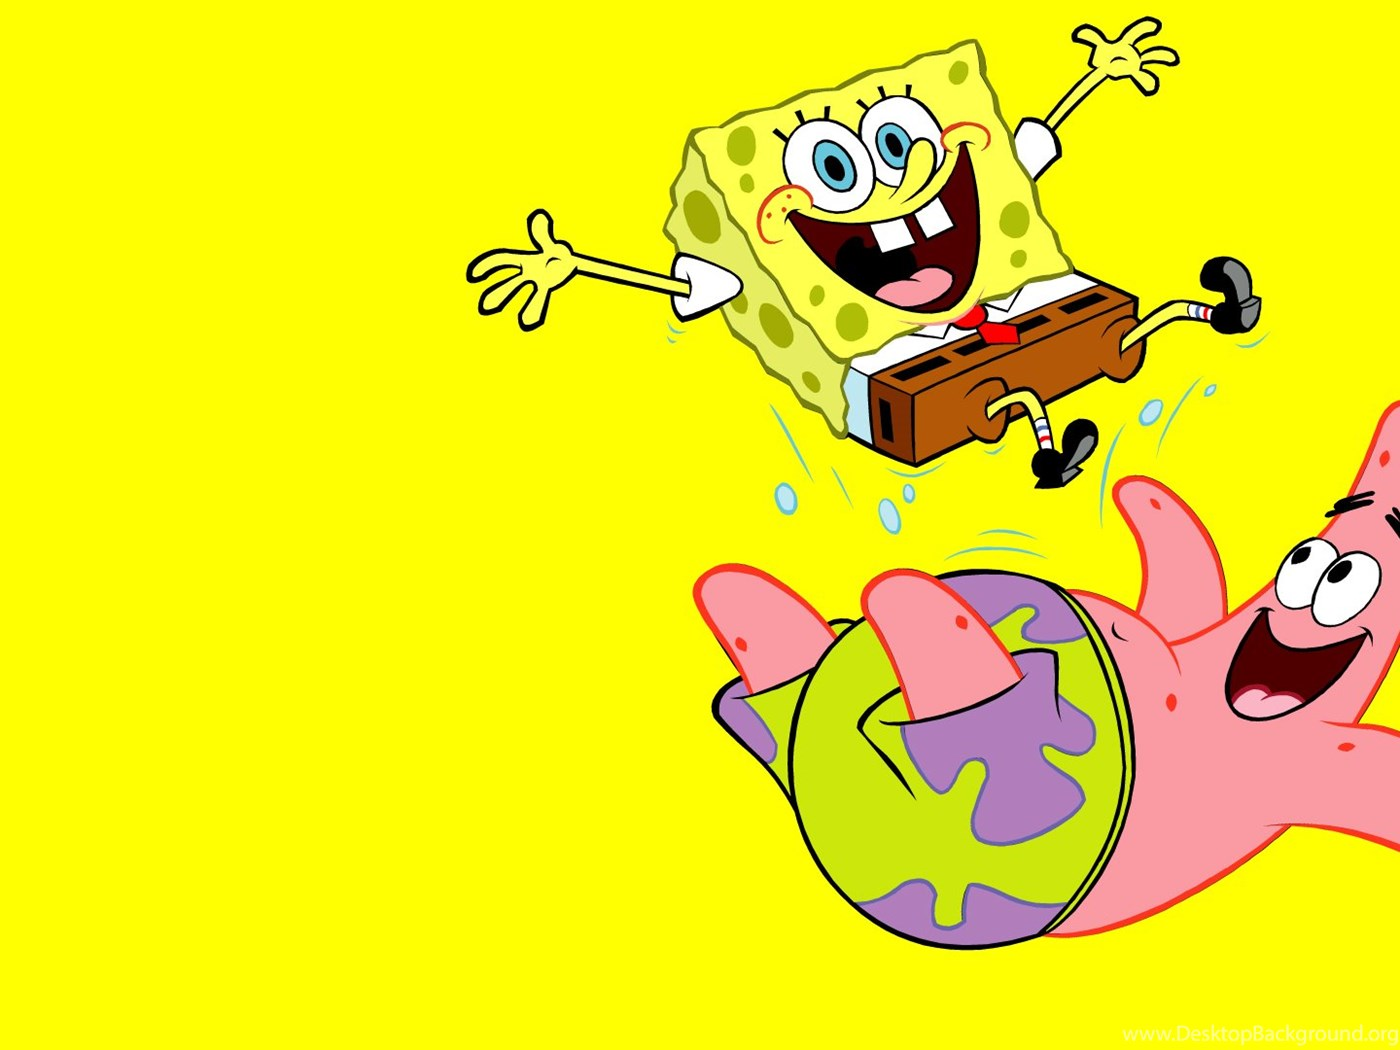 15 Hd Spongebob Squarepants Wallpapers Hdwallsource Com Desktop Background